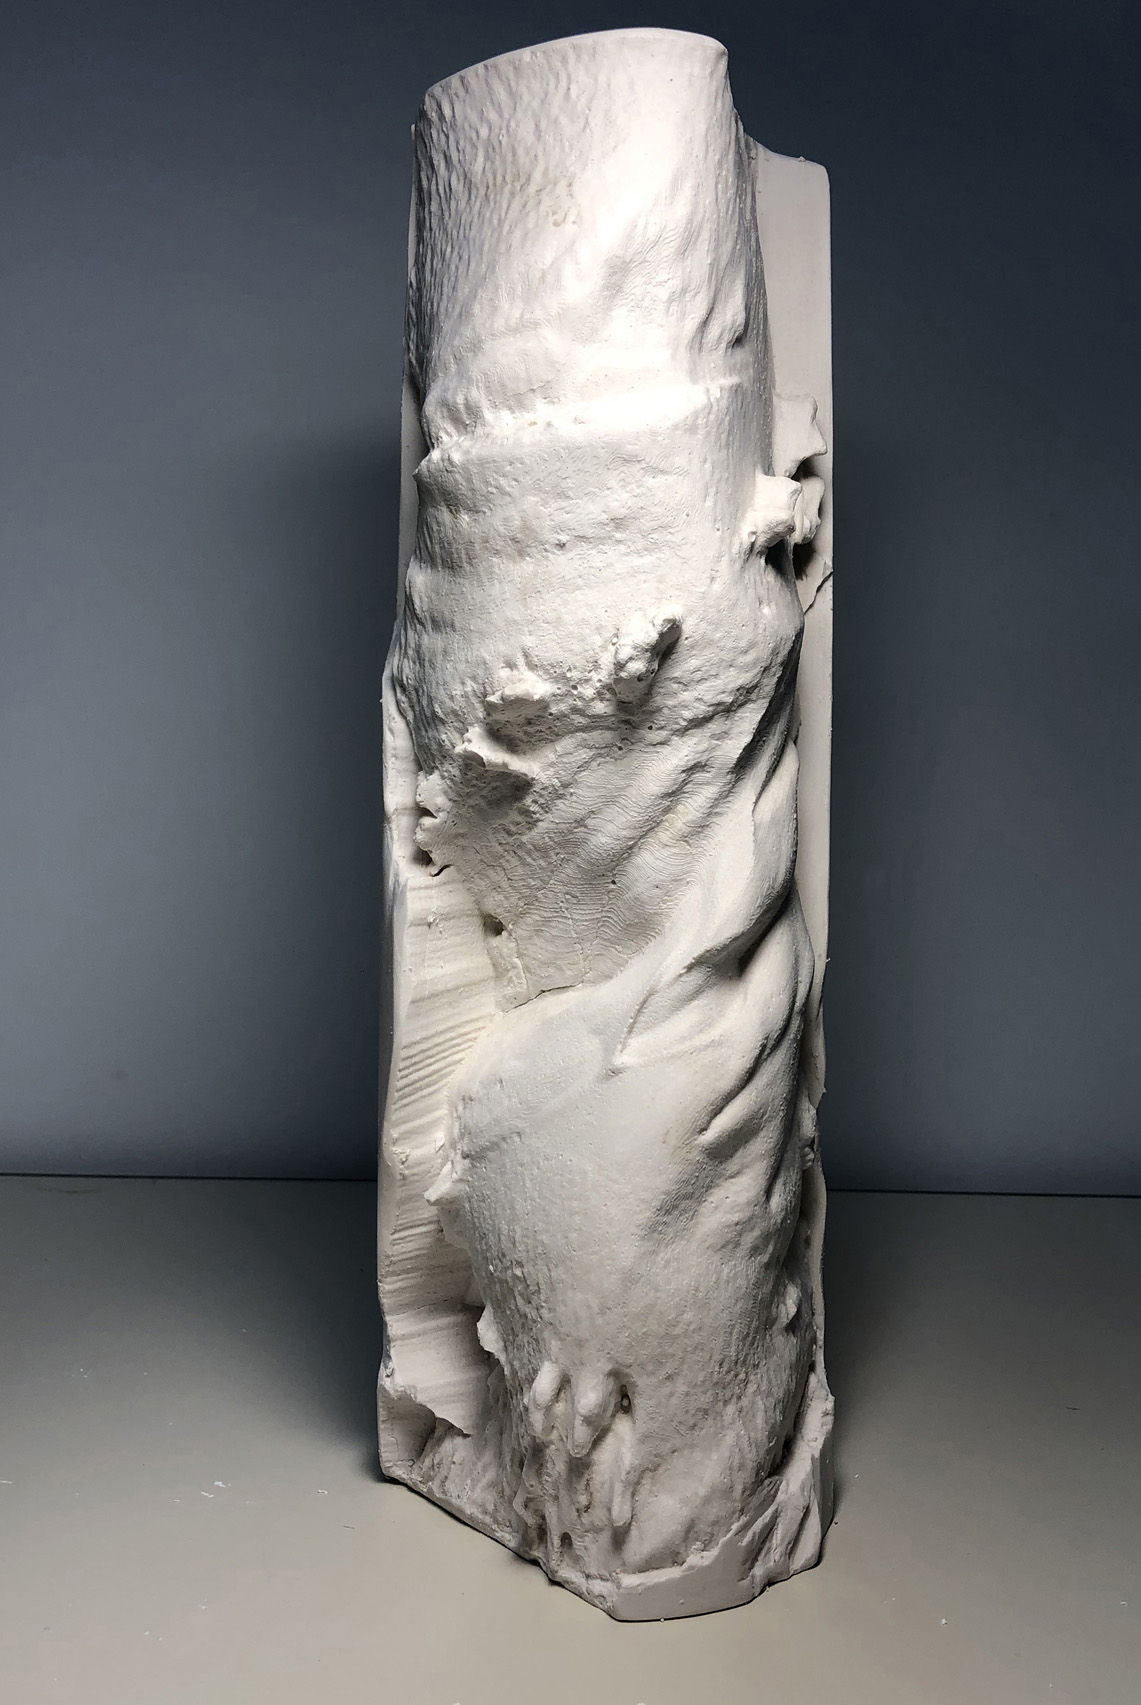 Patrick Thompson, Cylinder 1